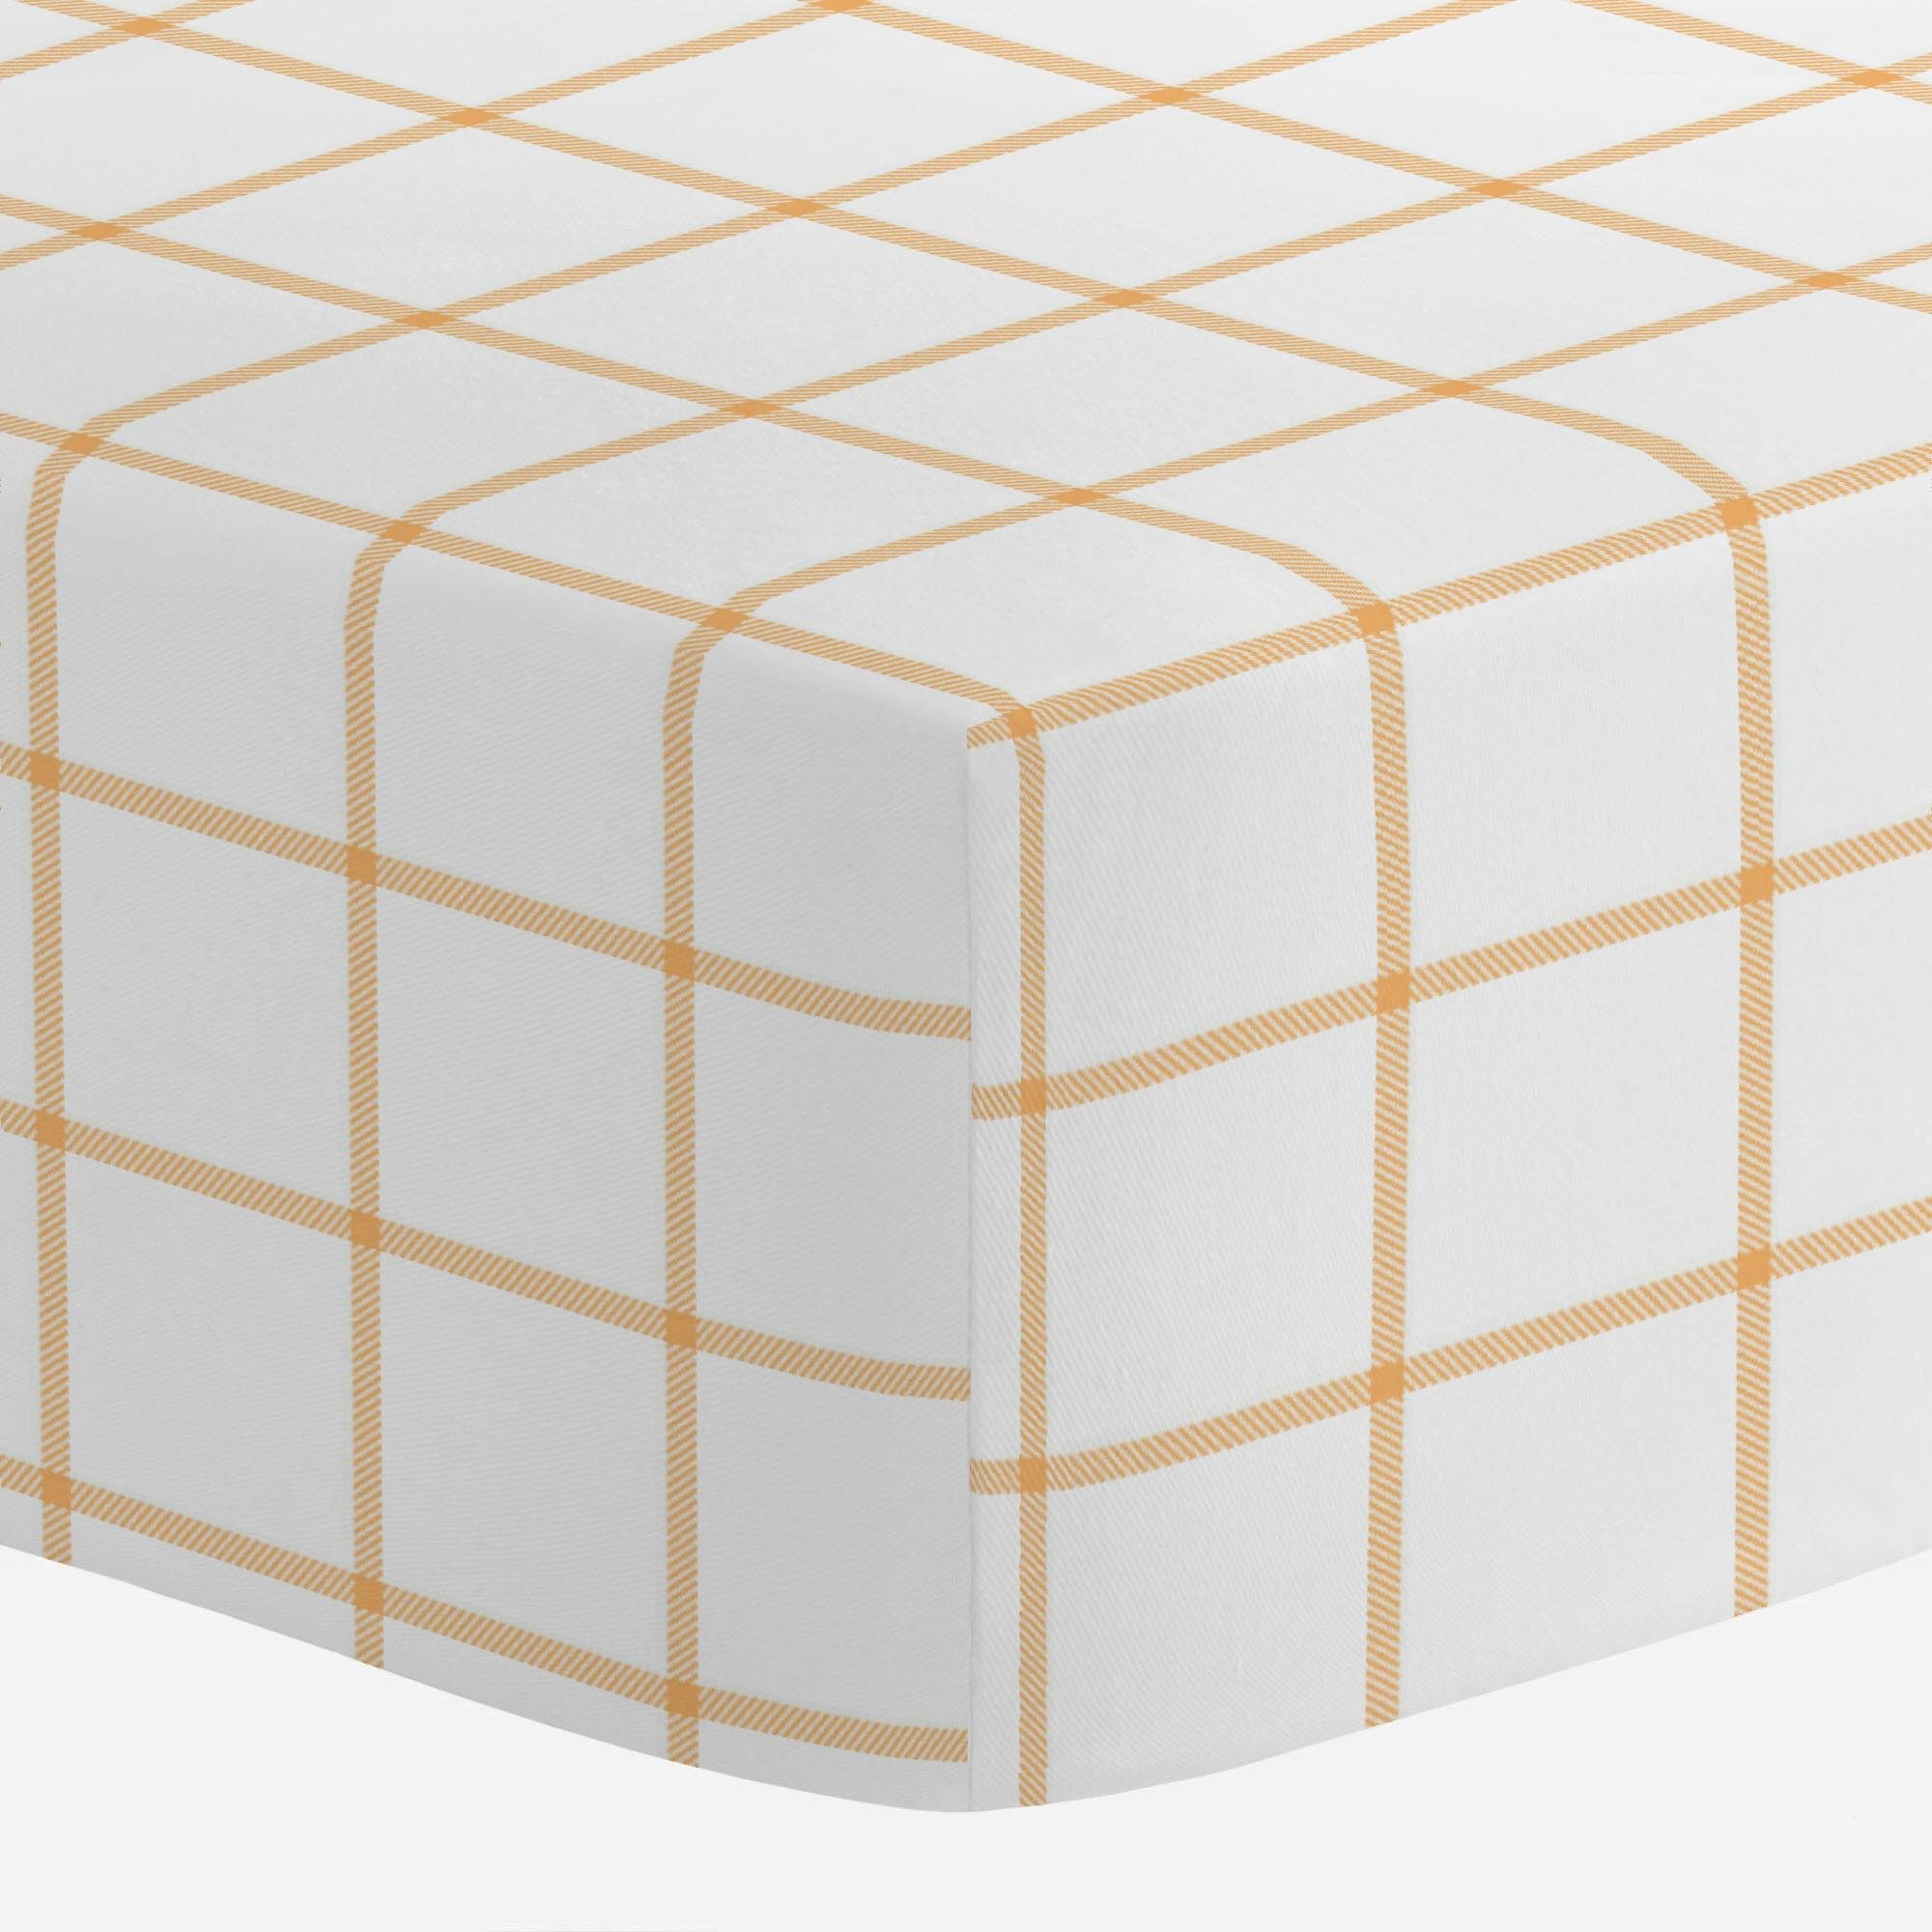 Carousel Designs Light Orange Windowpane Crib Sheet - Organic 100% Cotton Fitted Crib Sheet - Made in The USA